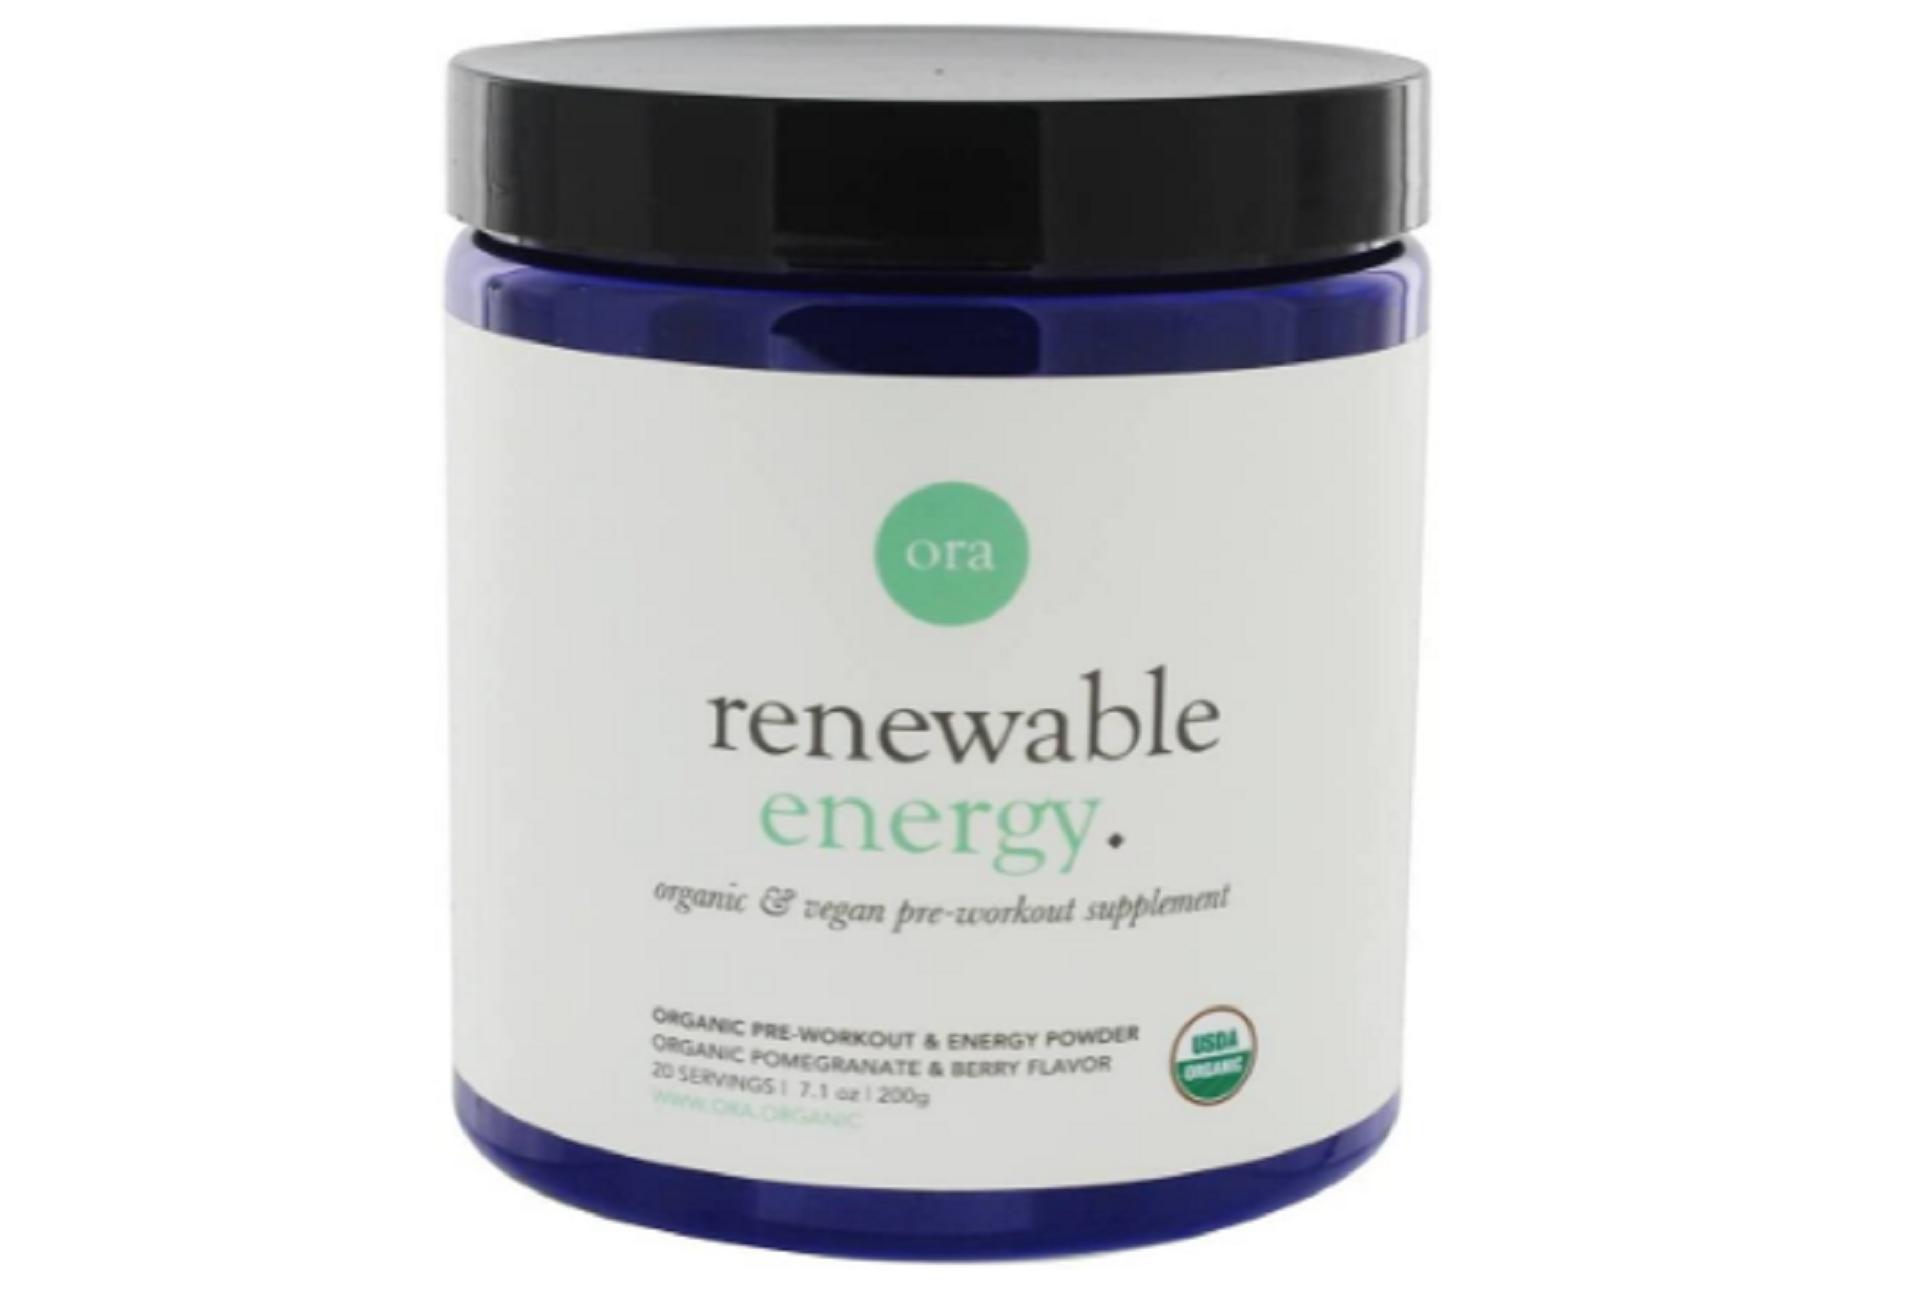 ora organic natural pre-workout supplement